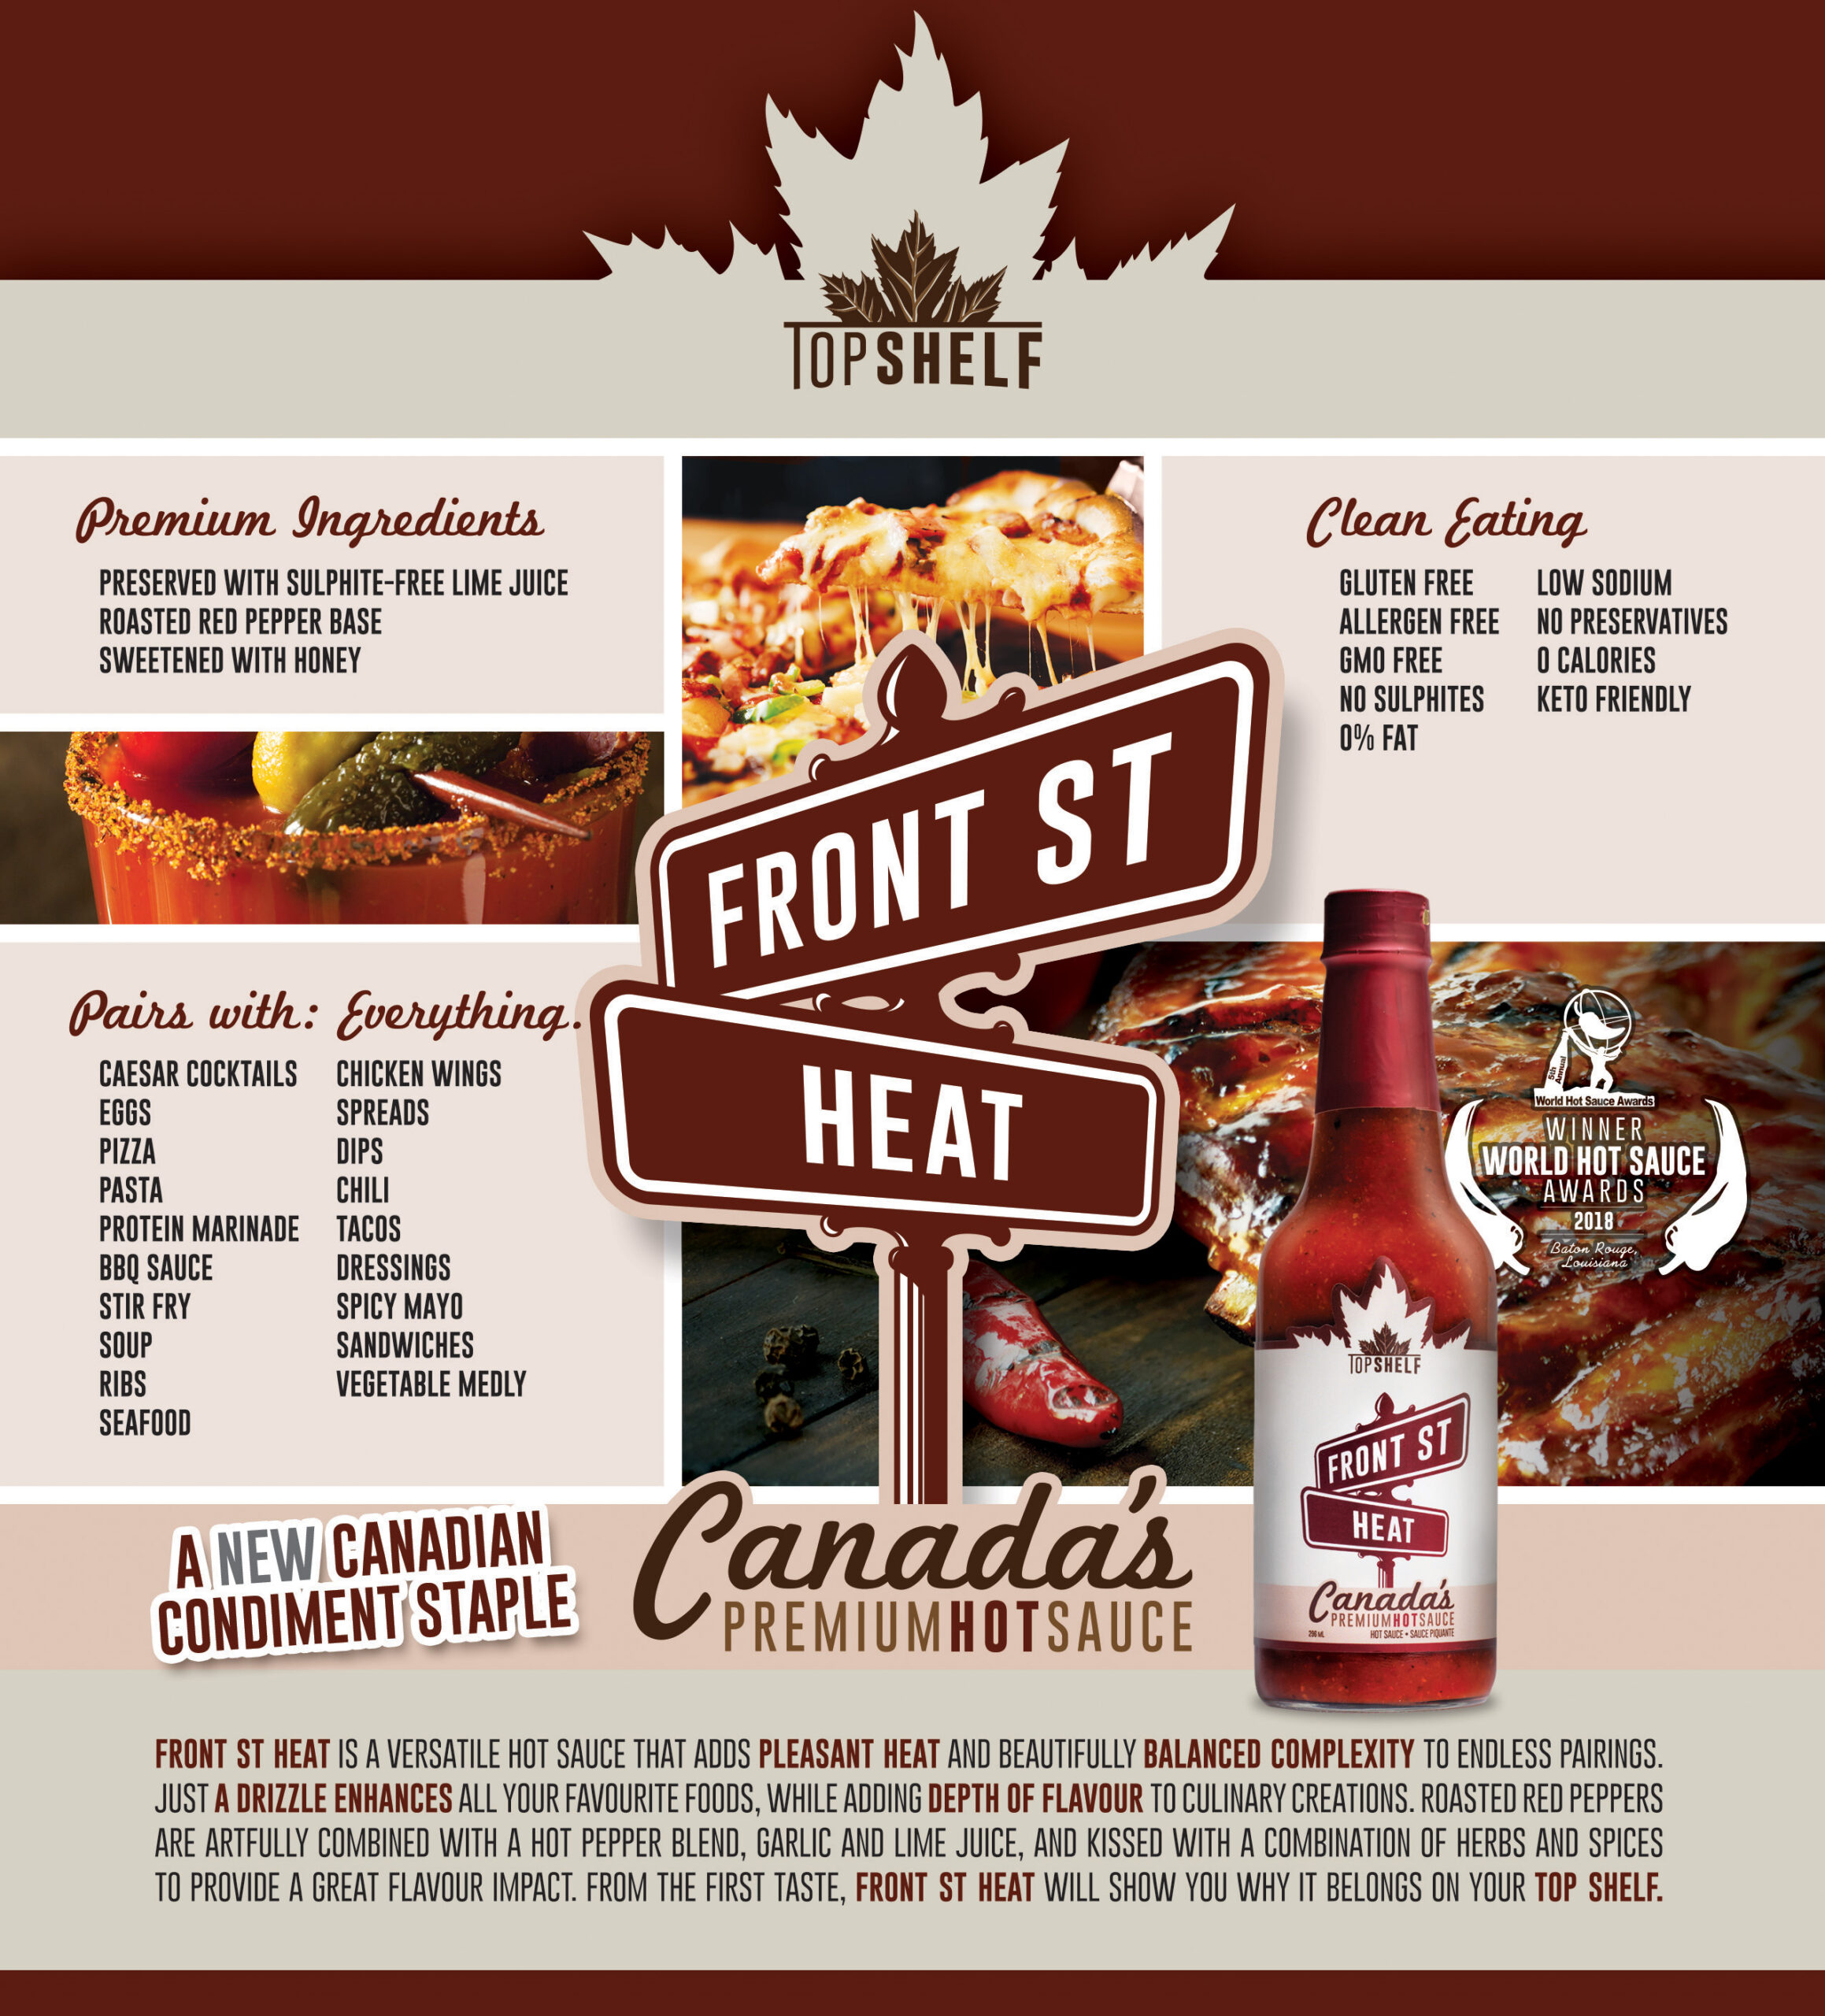 Top Shelf - Front Street Heat: Canada's Premium Hot Sauce